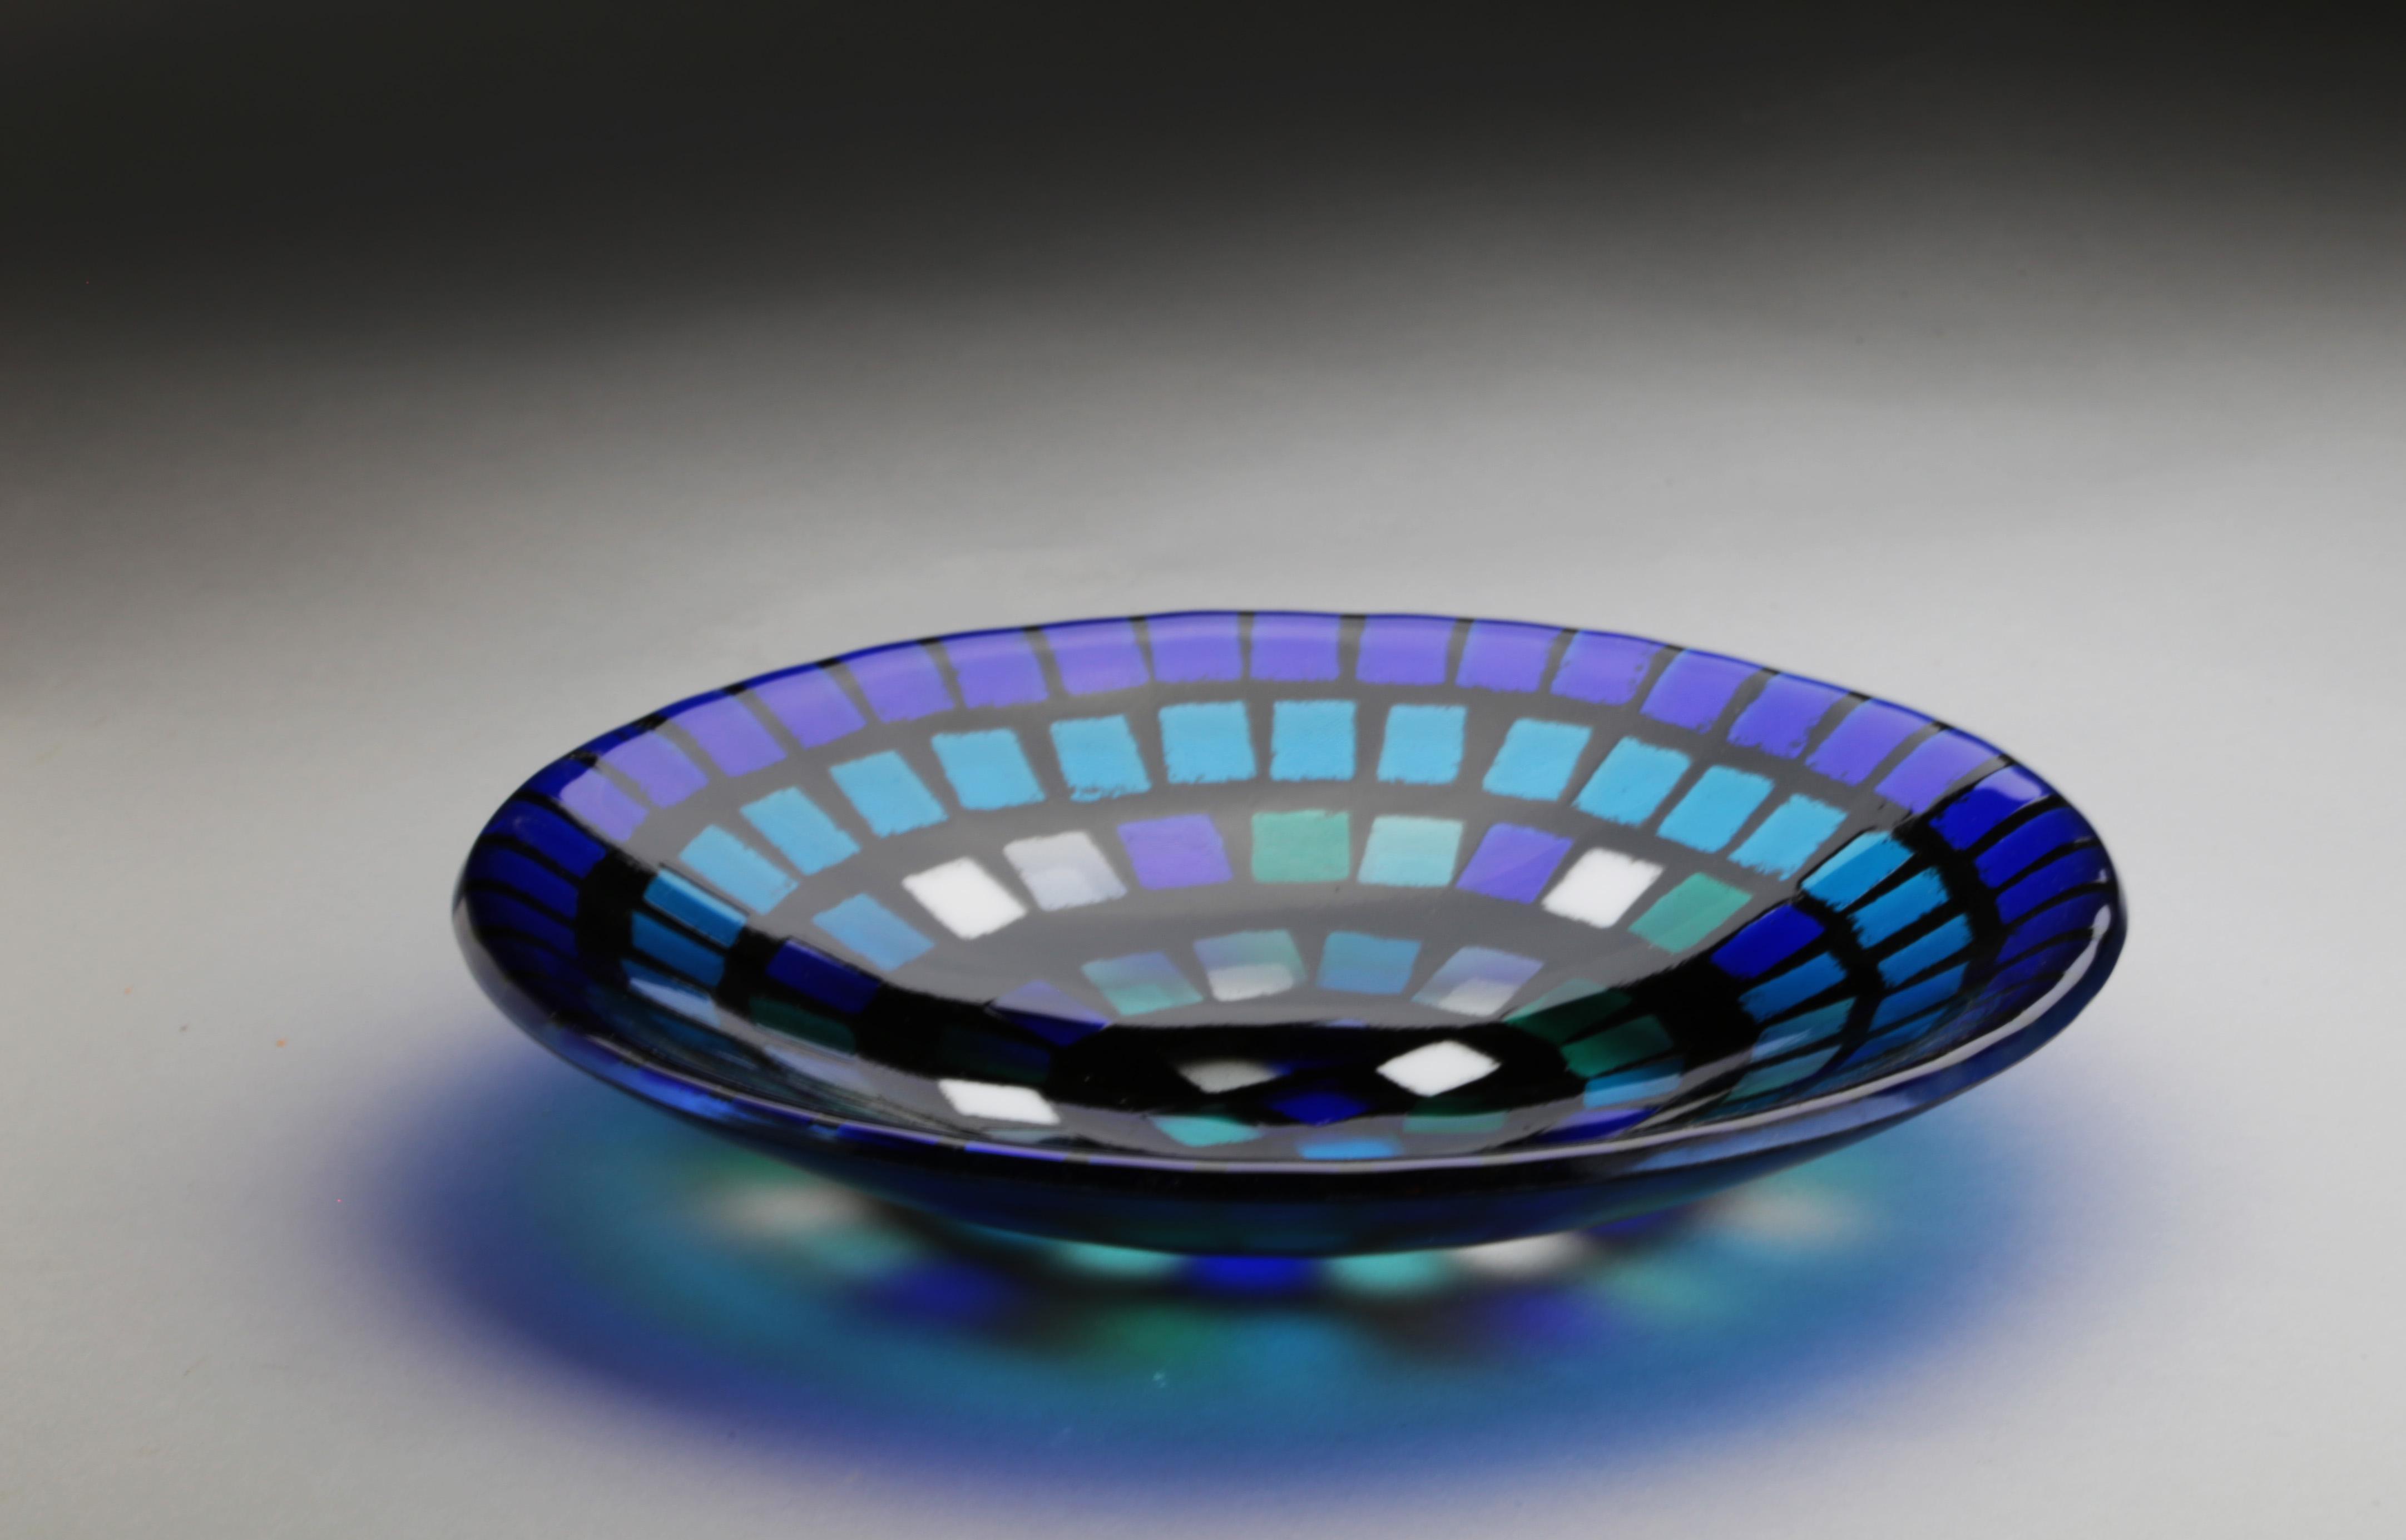 LP Class Mosaic 9 Bowl